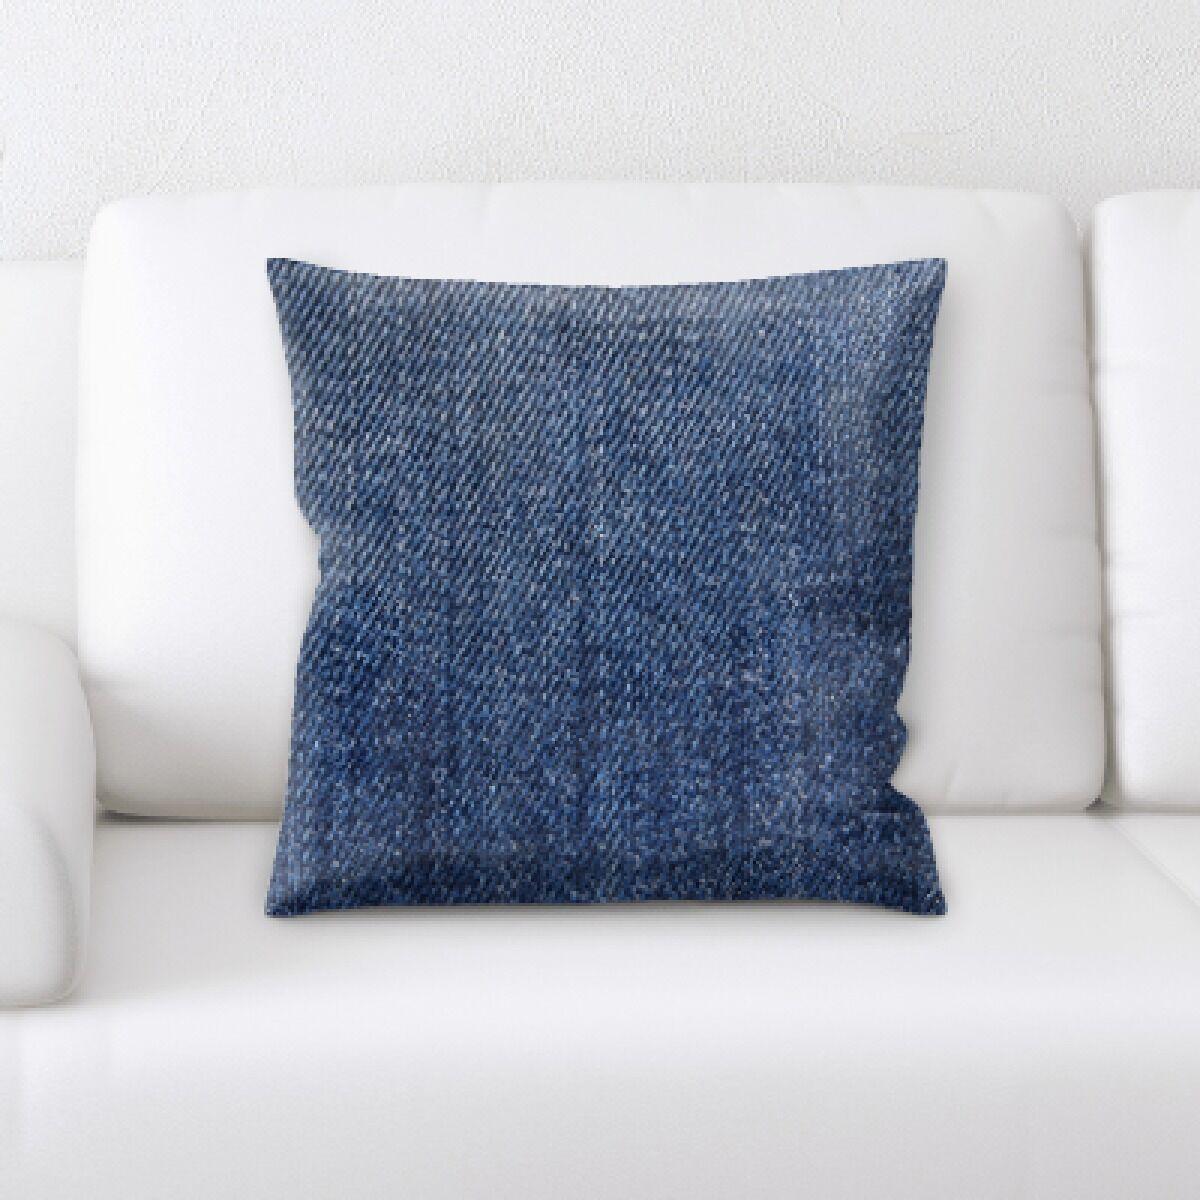 Guerrette Jean Texture Throw Pillow